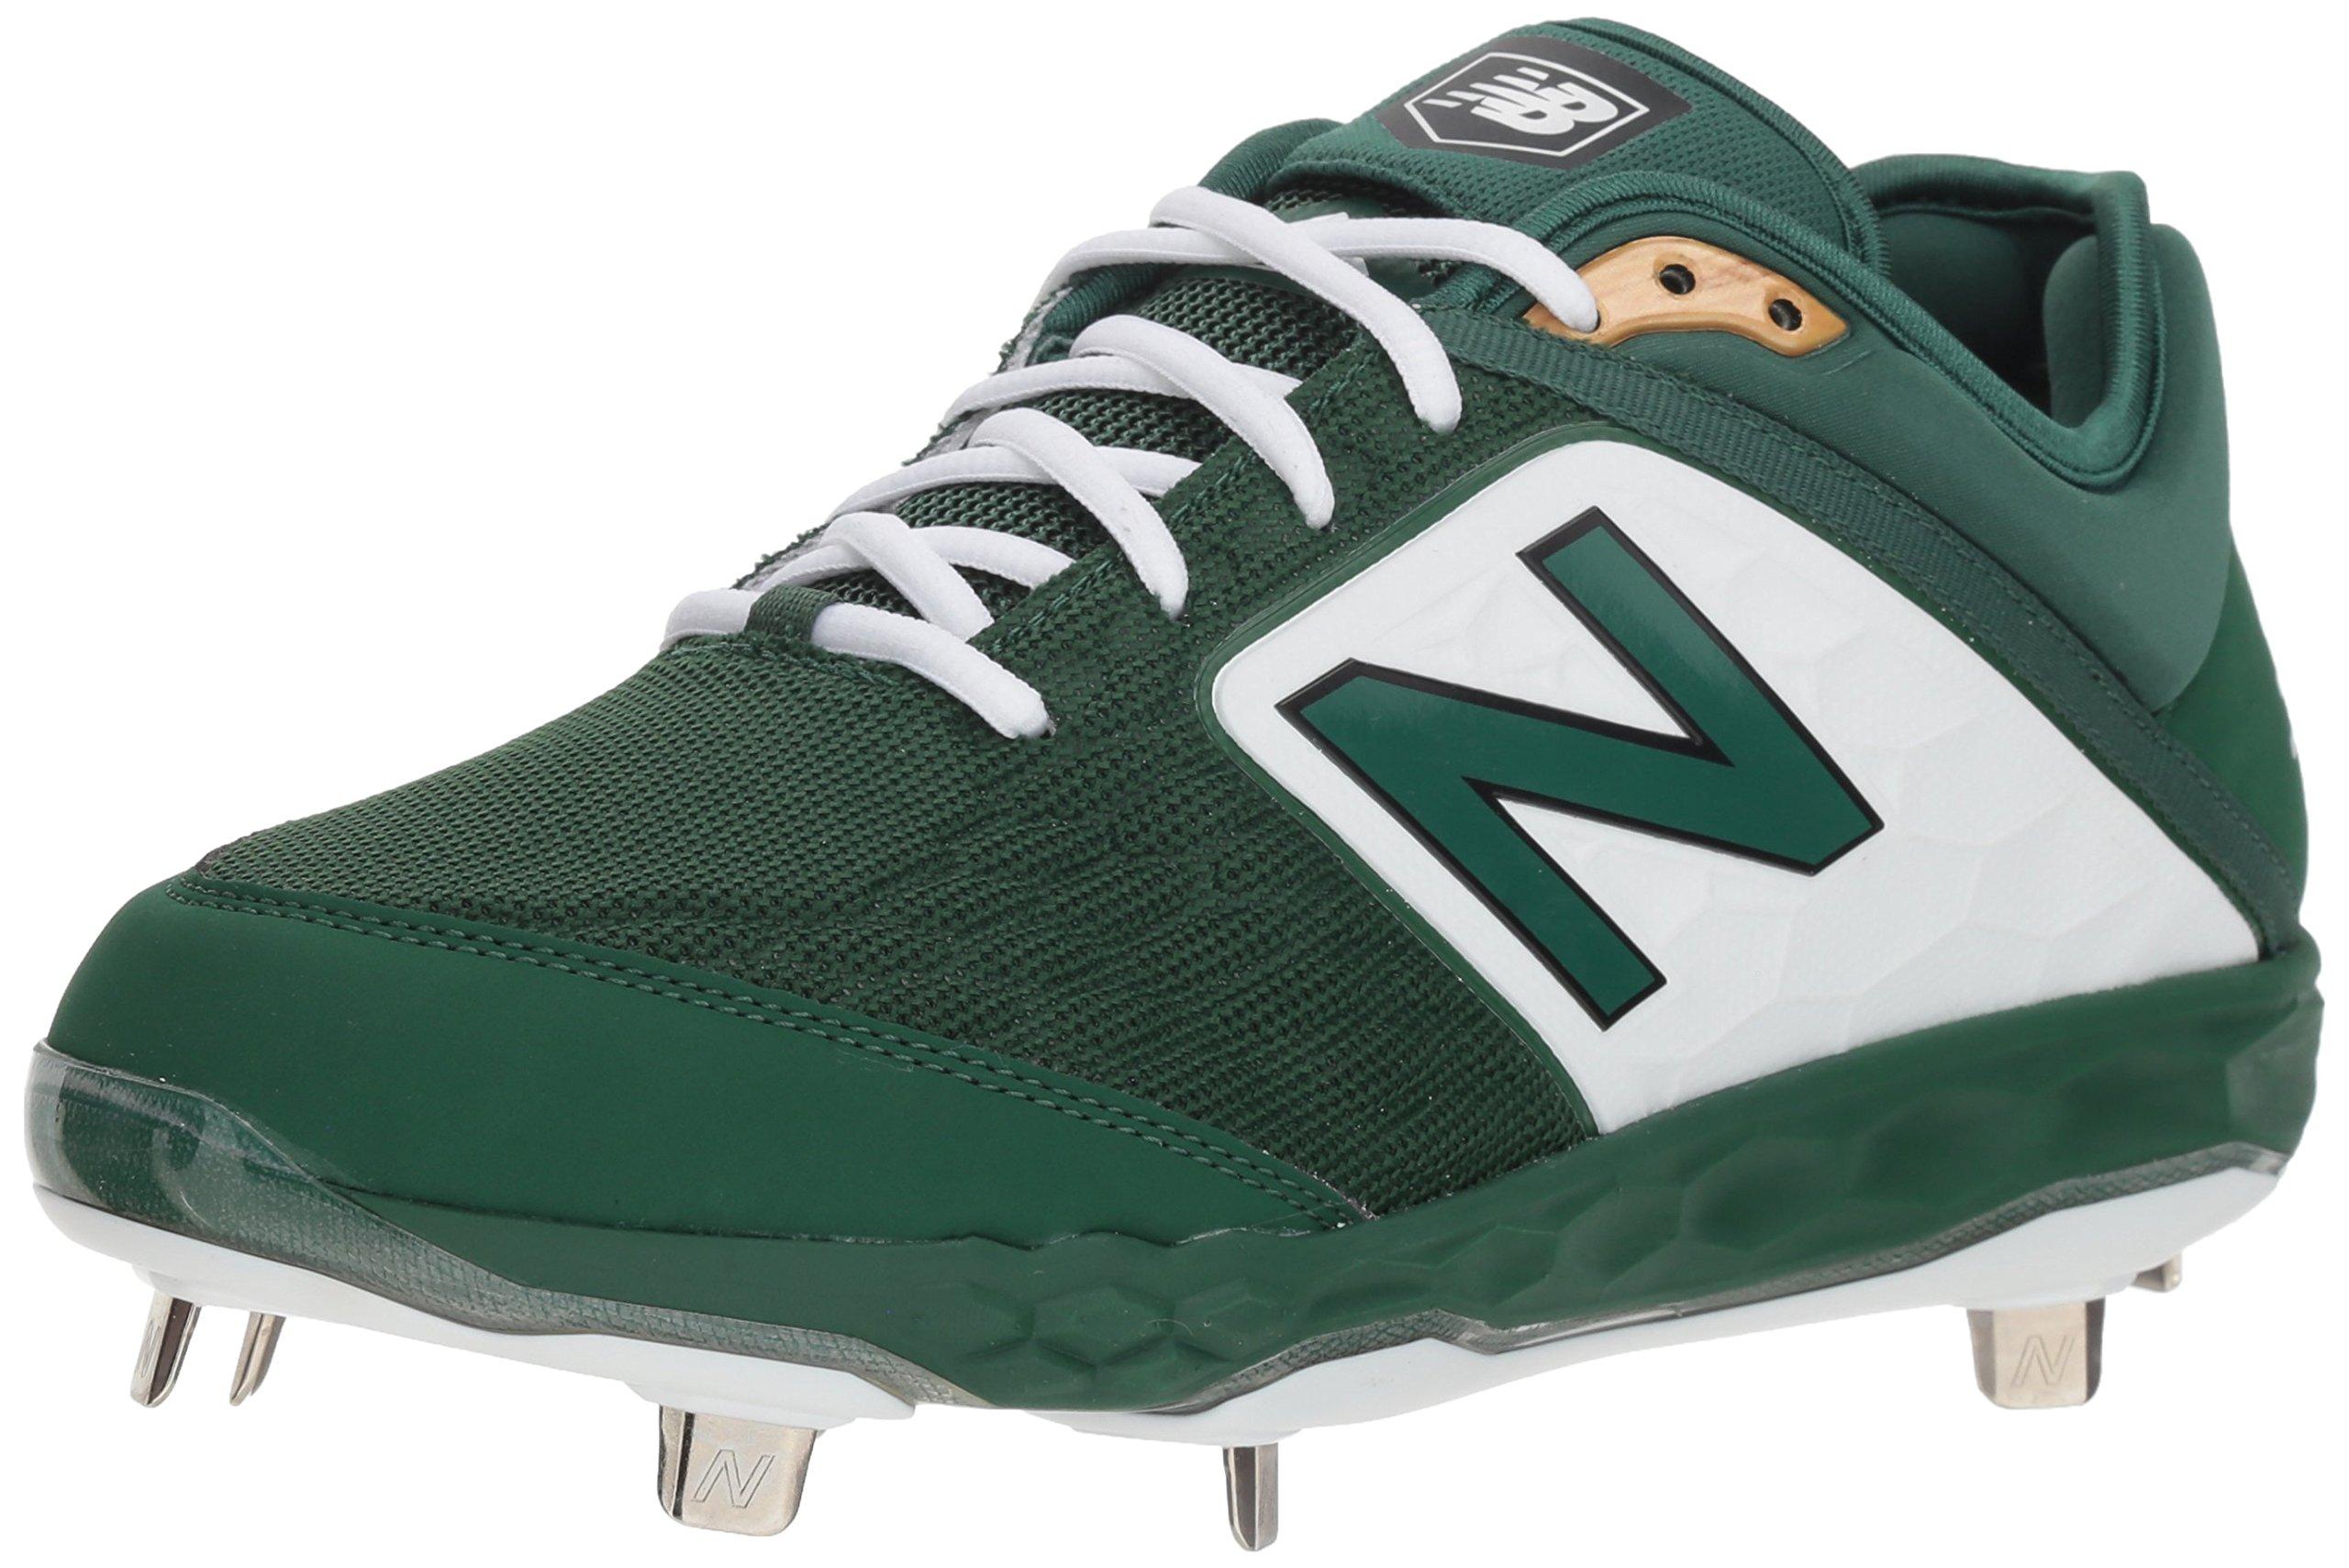 New Balance Men's 3000v4 Baseball Shoe, Green/White, 5 2E US